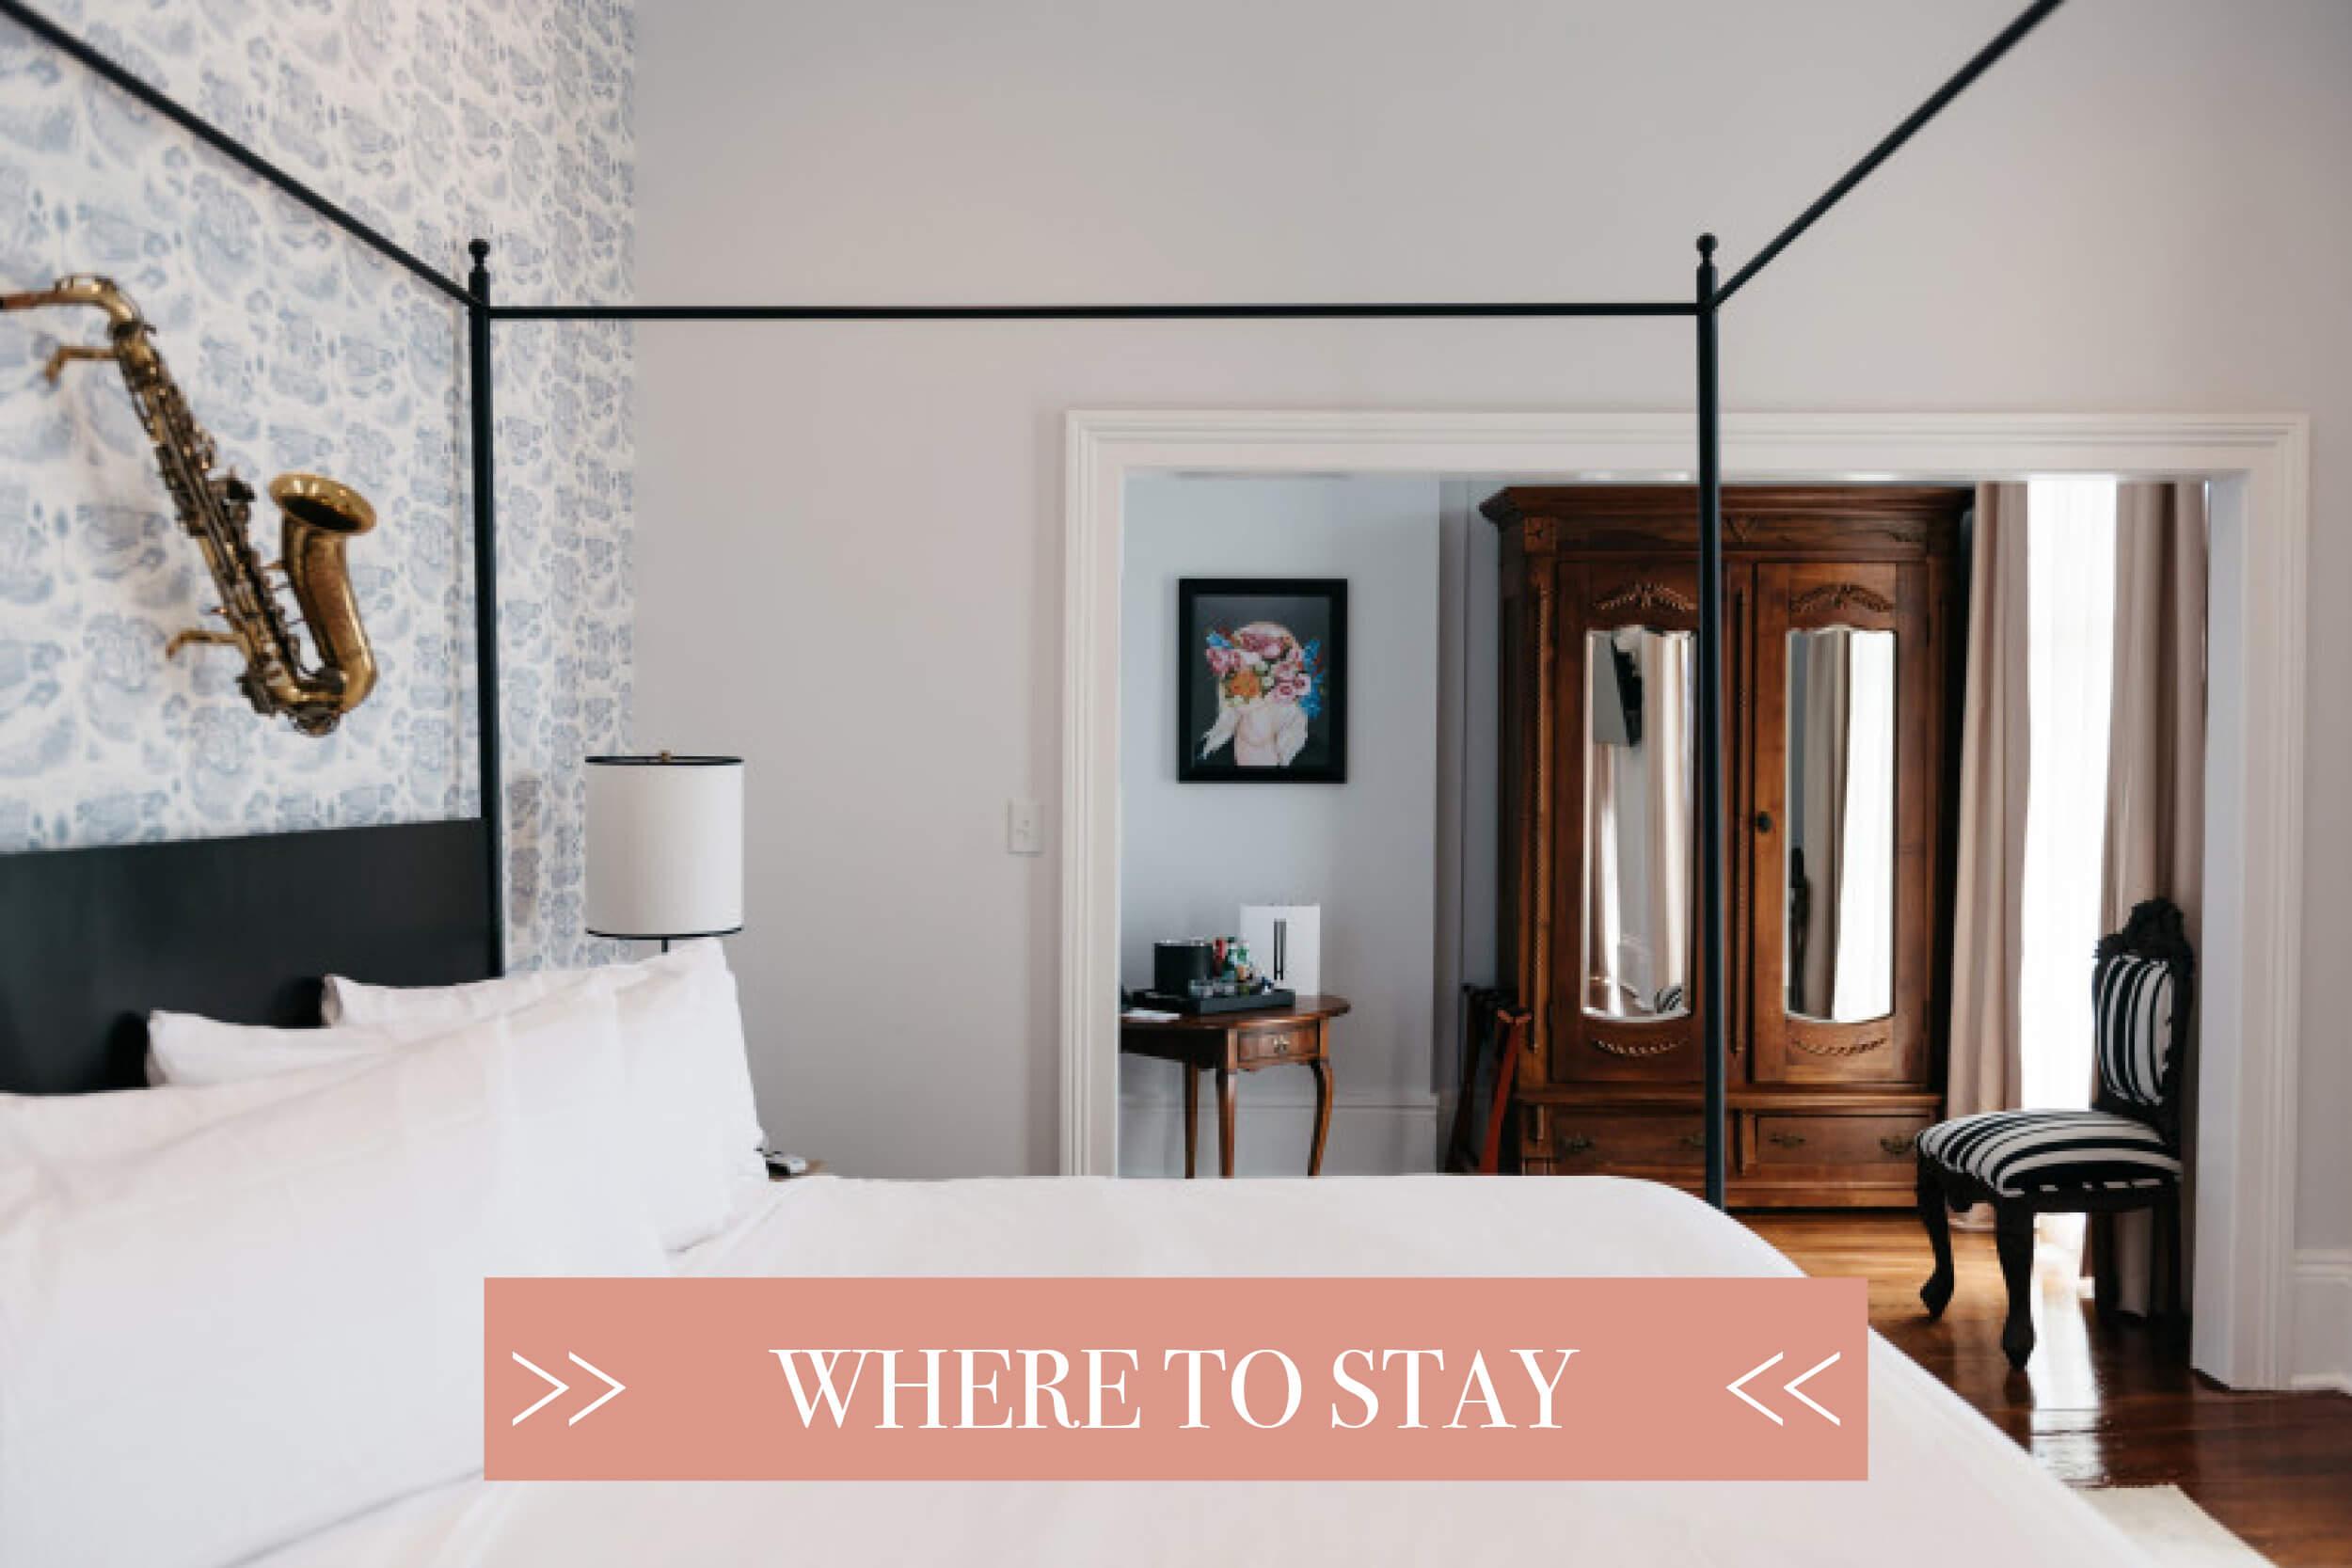 nola-stay.jpg